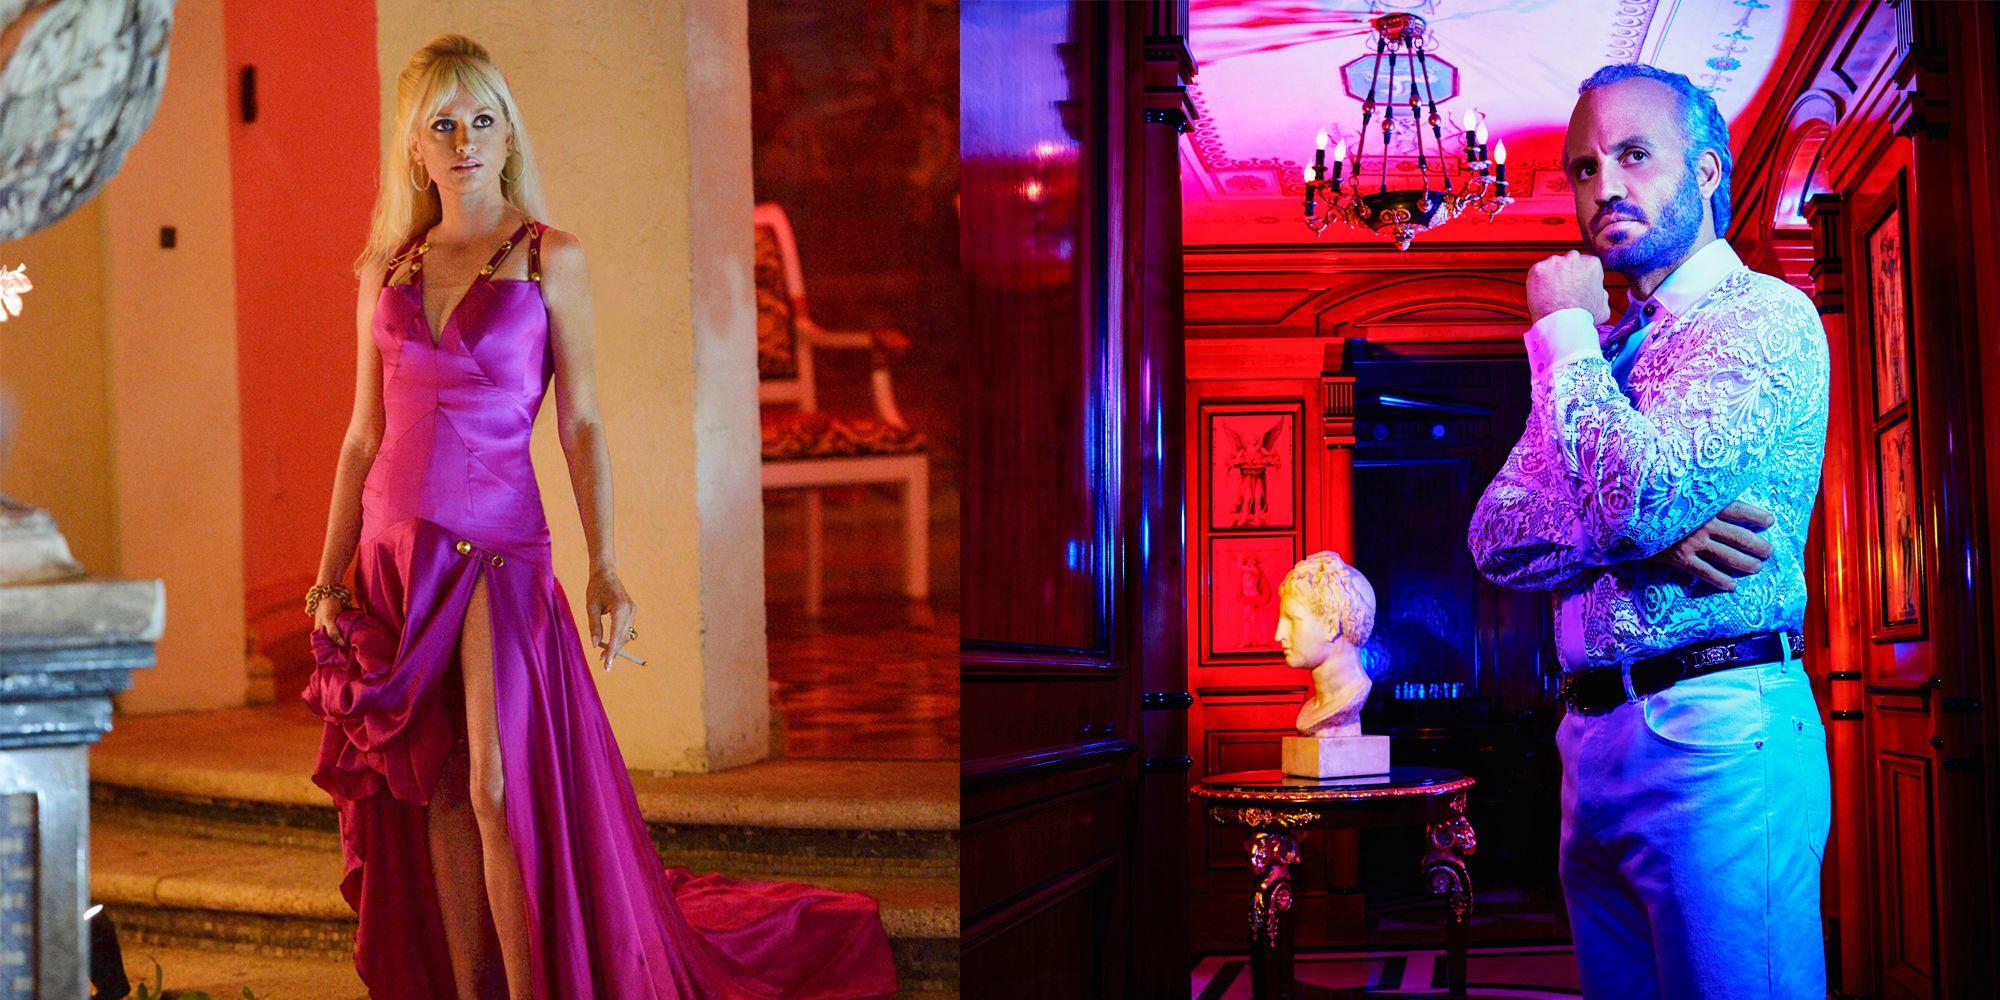 614337e5750c Penelope Cruz   Edgar Ramirez Interview on the Versace Family Drama and  Legacy